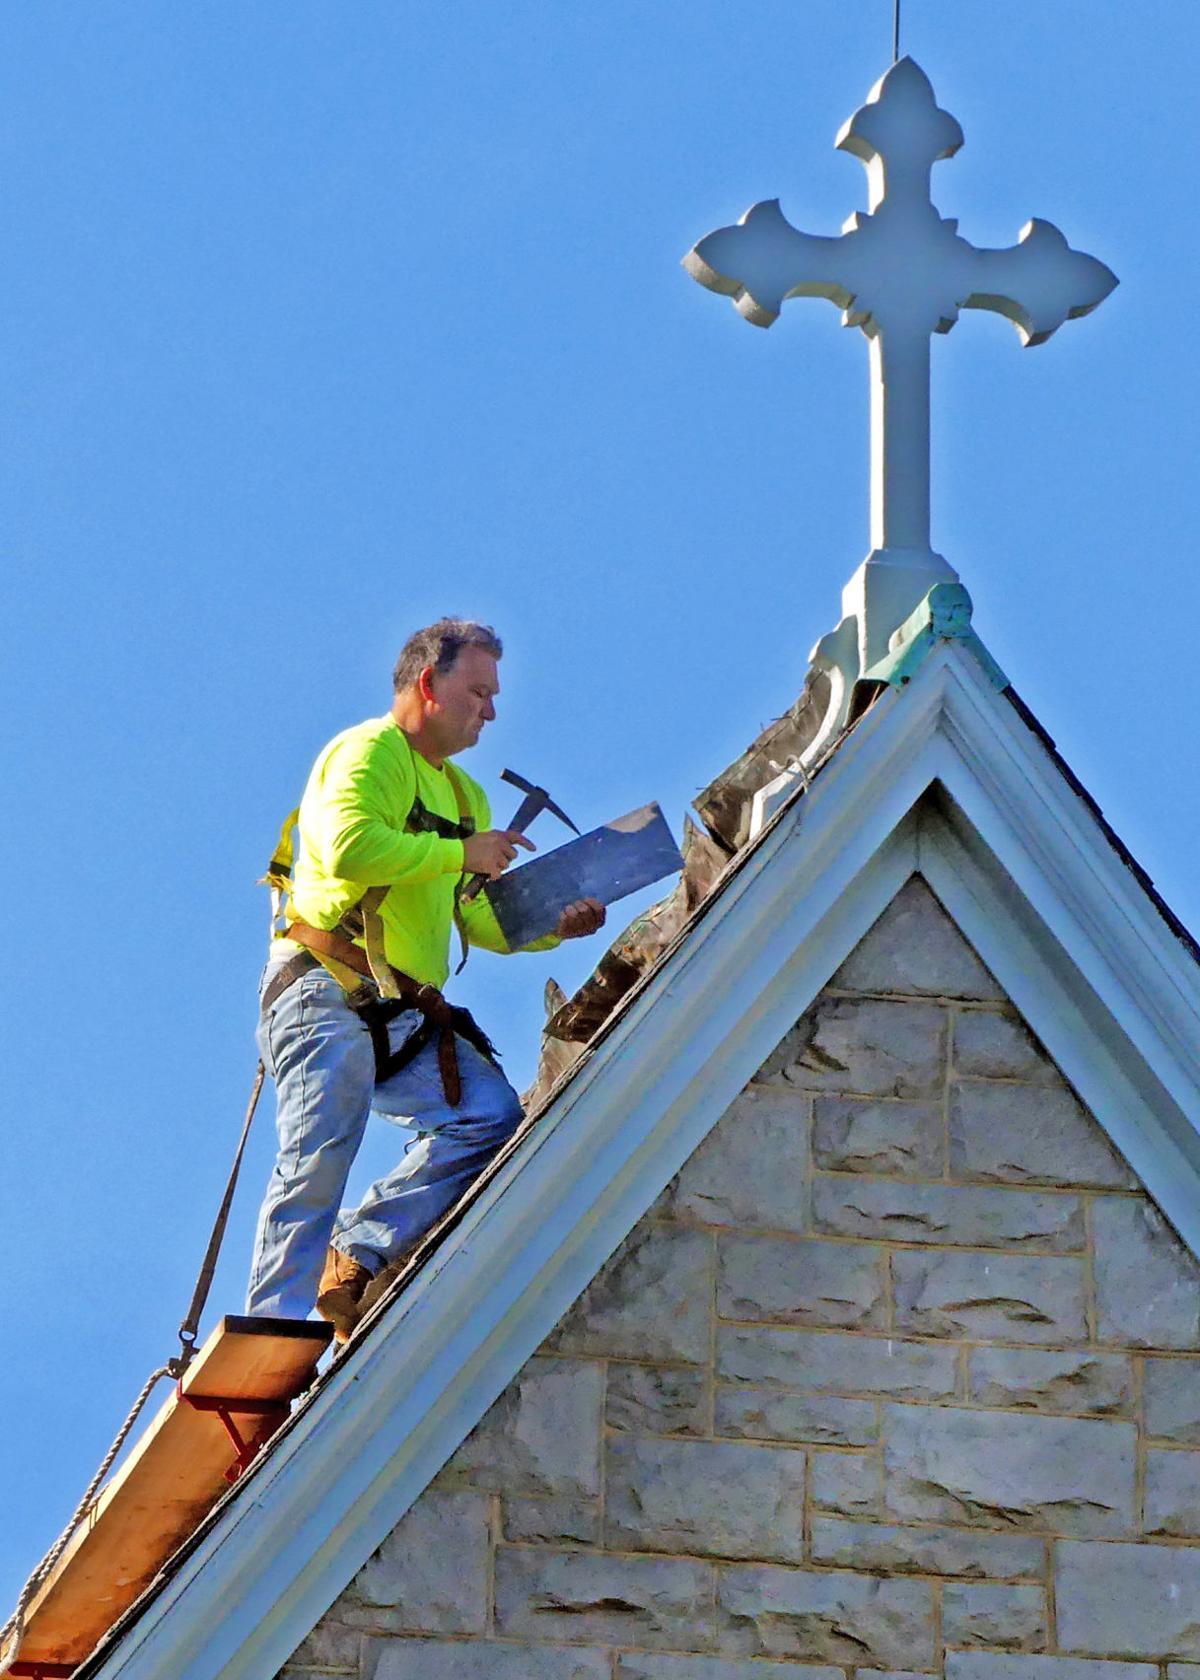 090919 WES Christ Church roof work 532.JPG